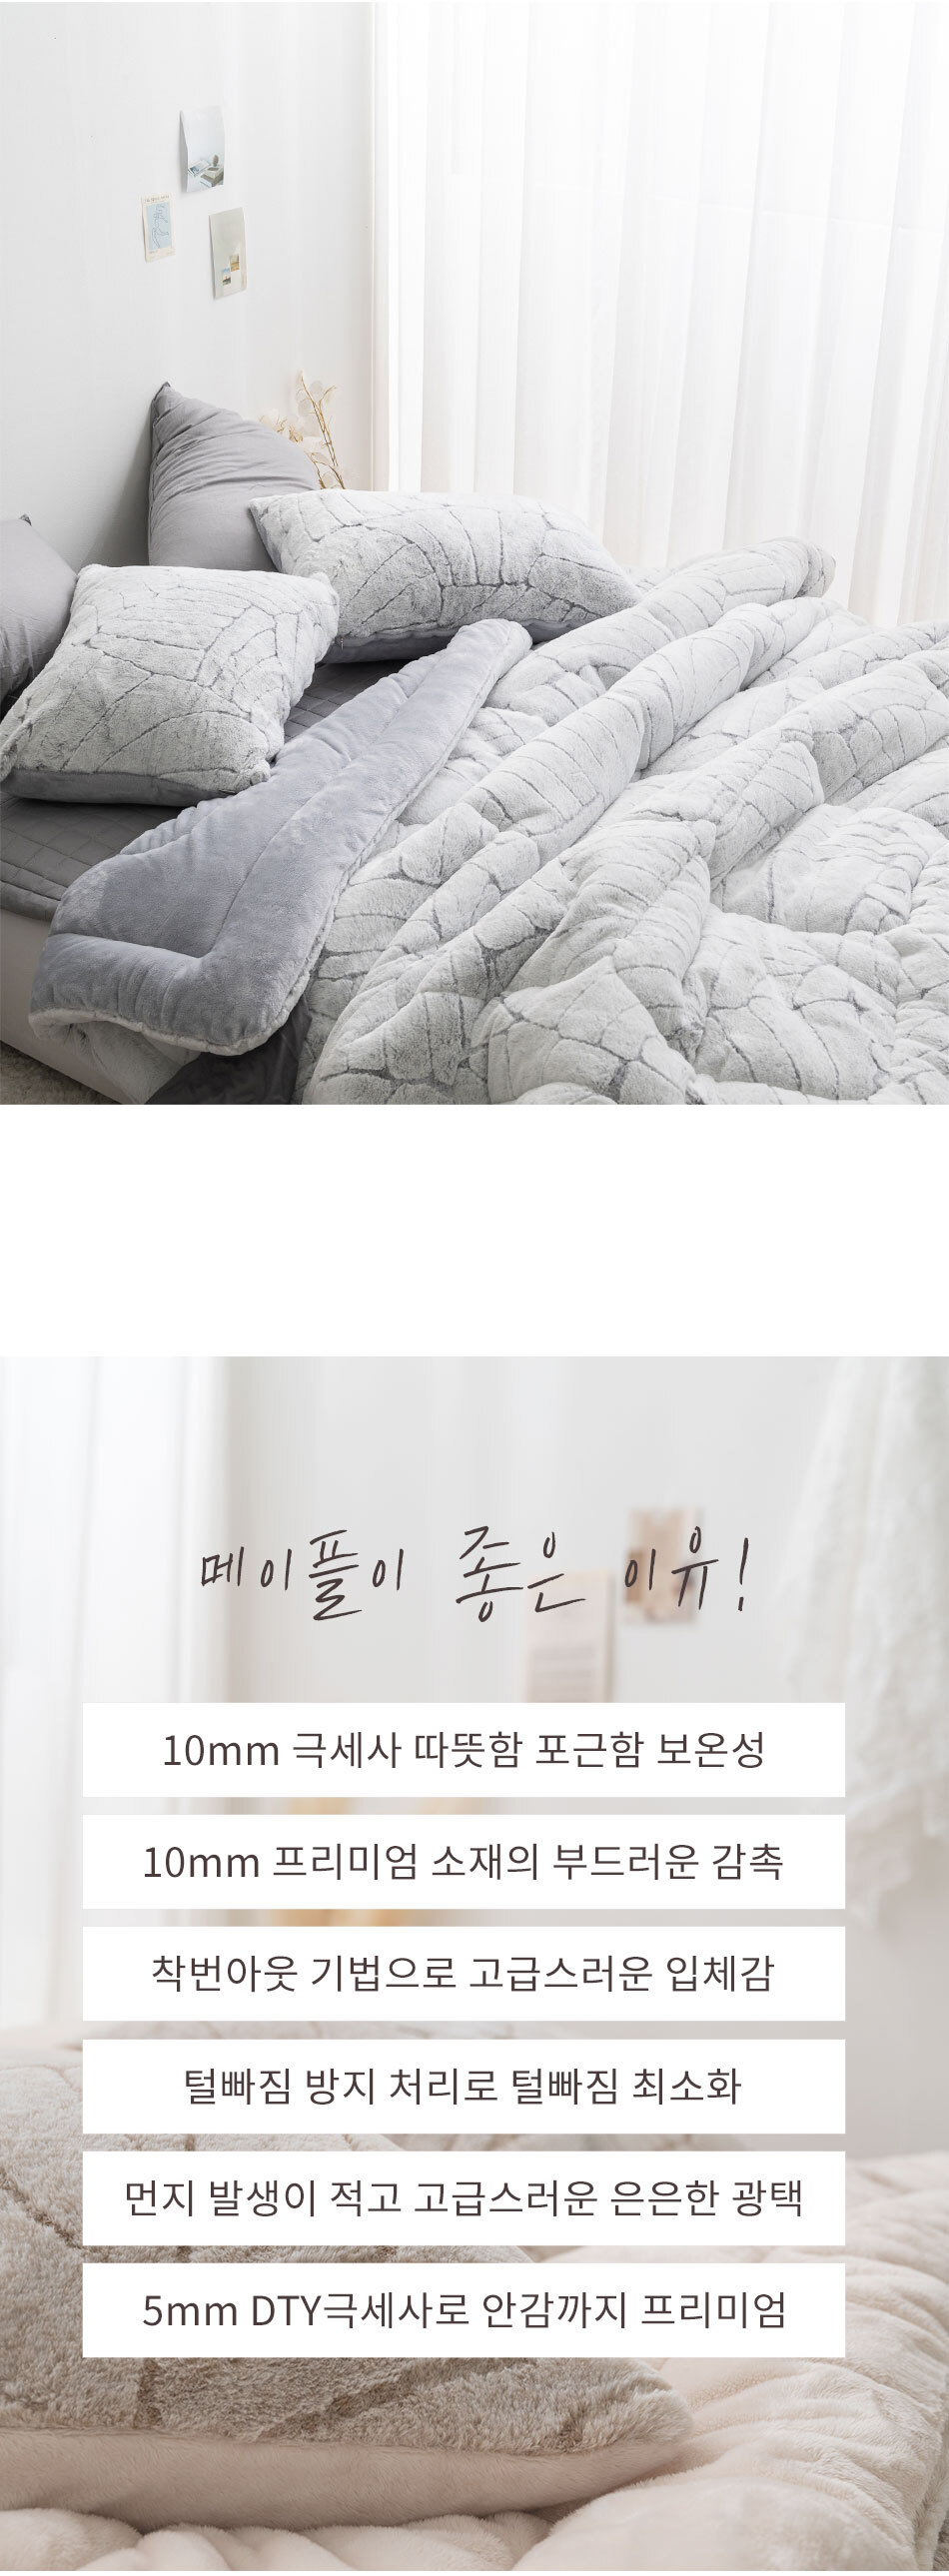 maple_bed_01.jpg